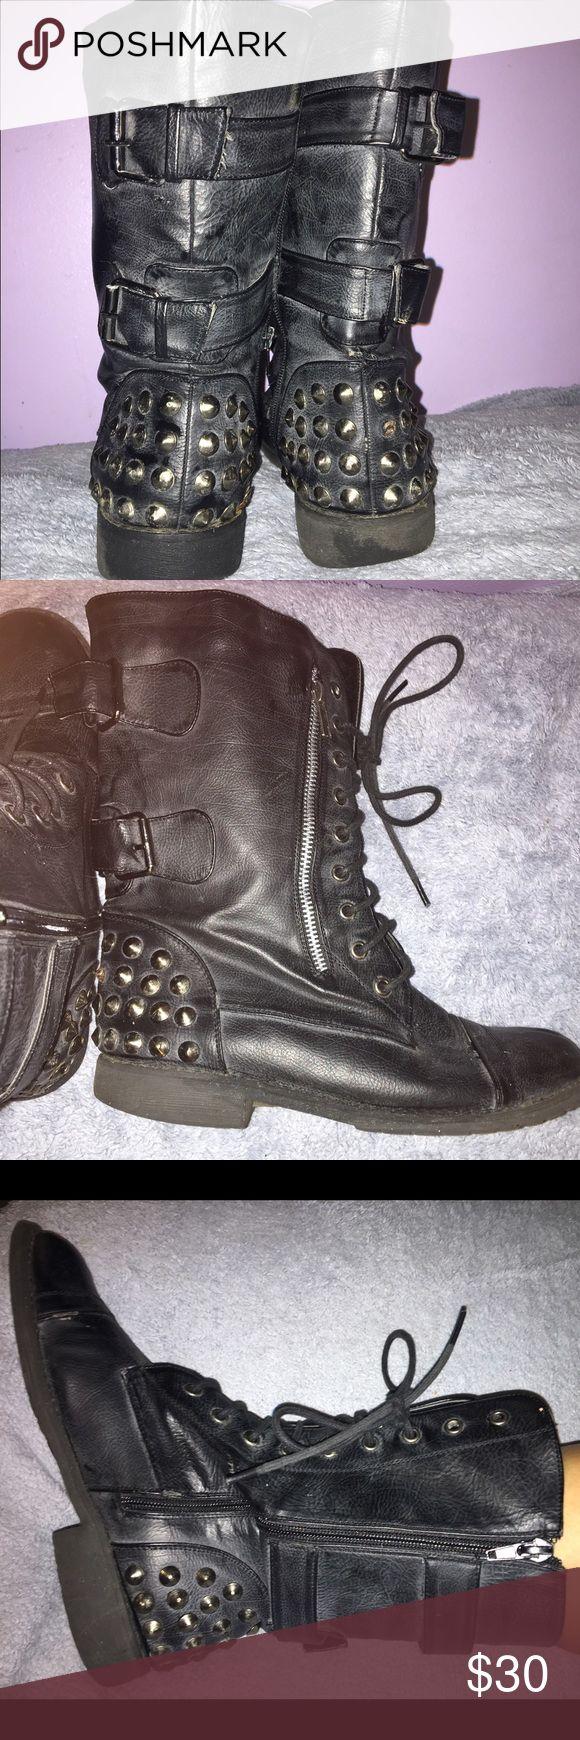 Black studded combat boots Black studded combat boots Shoes Combat & Moto Boots